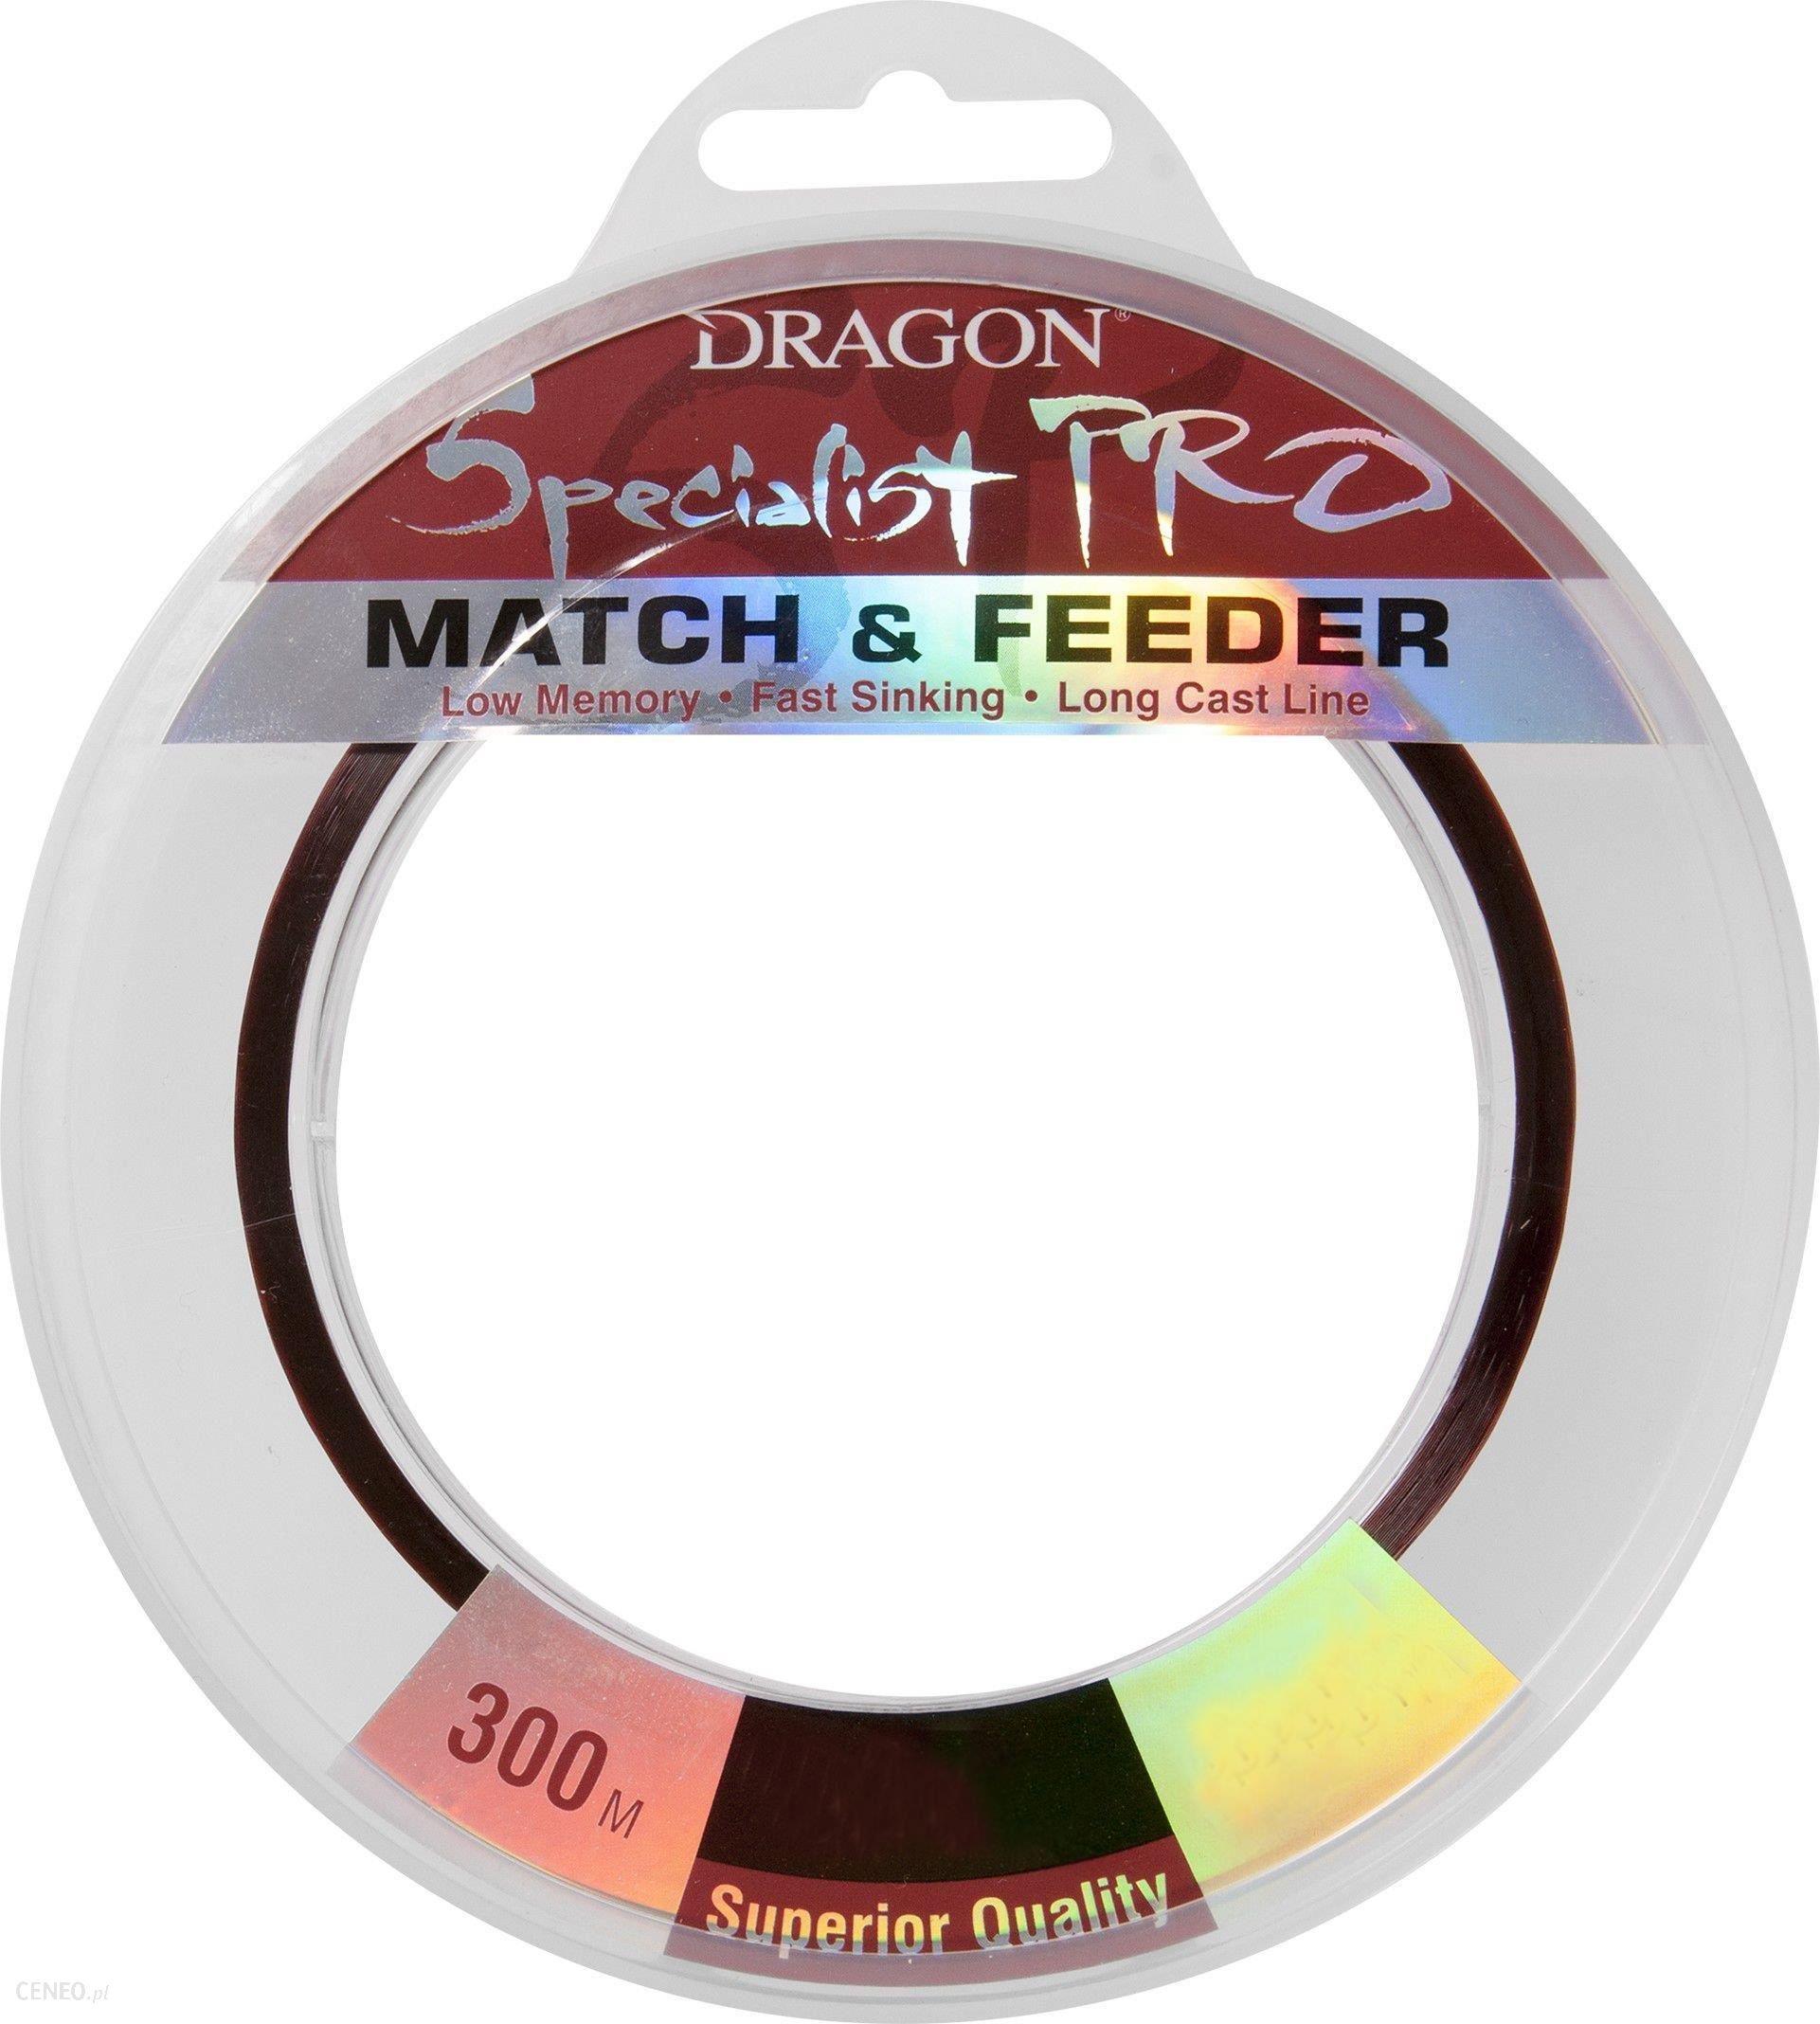 Dragon Fishing Żyłka Pro Match&Feeder Brązowa 0.20Mm 300M 5.70Kg